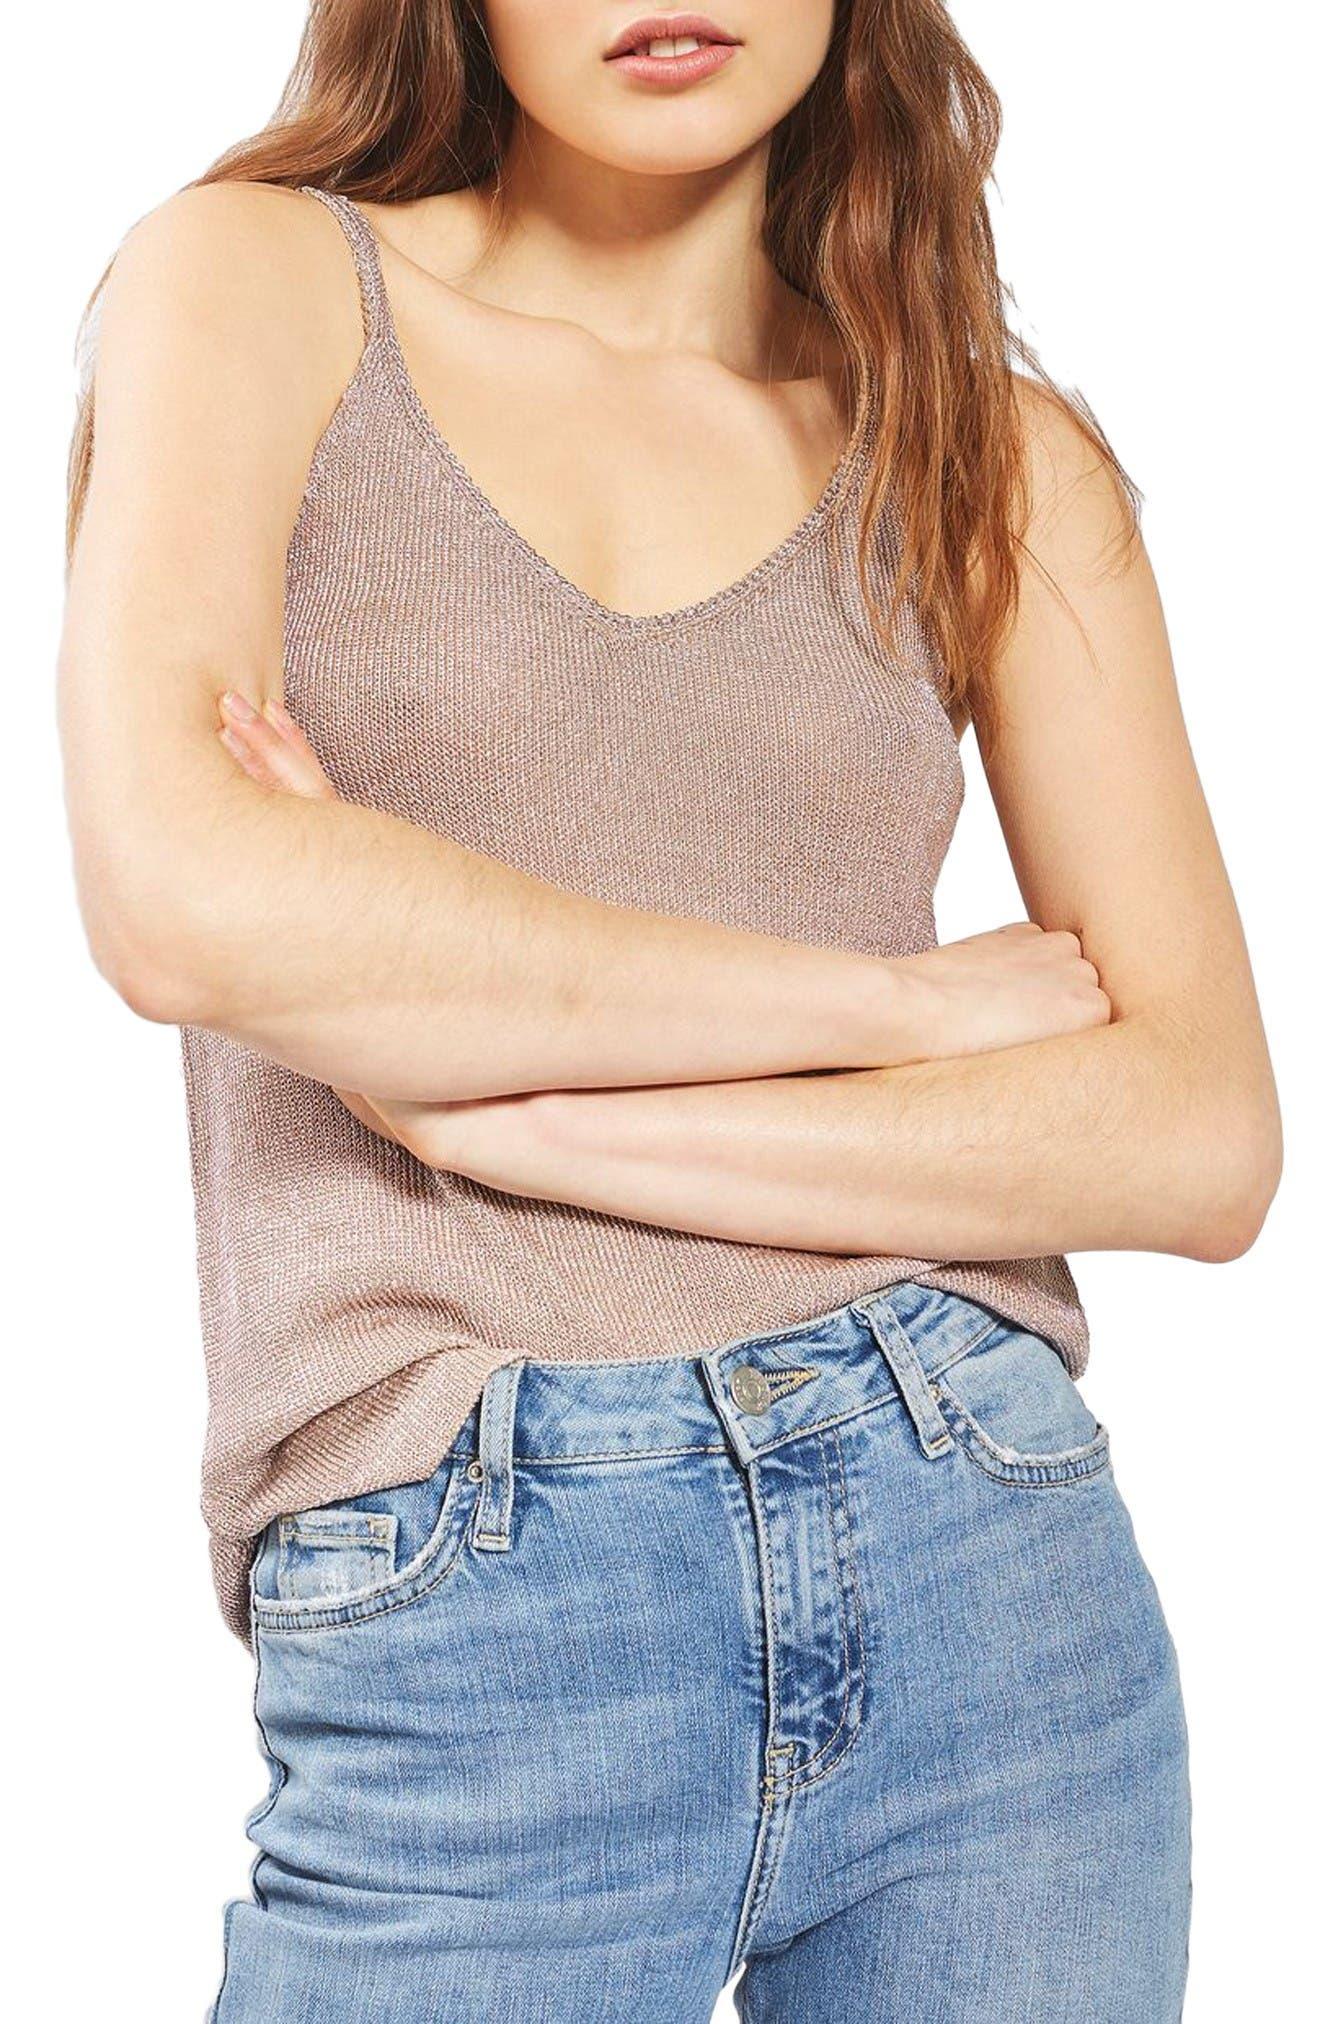 Topshop Metallic Knit Camisole